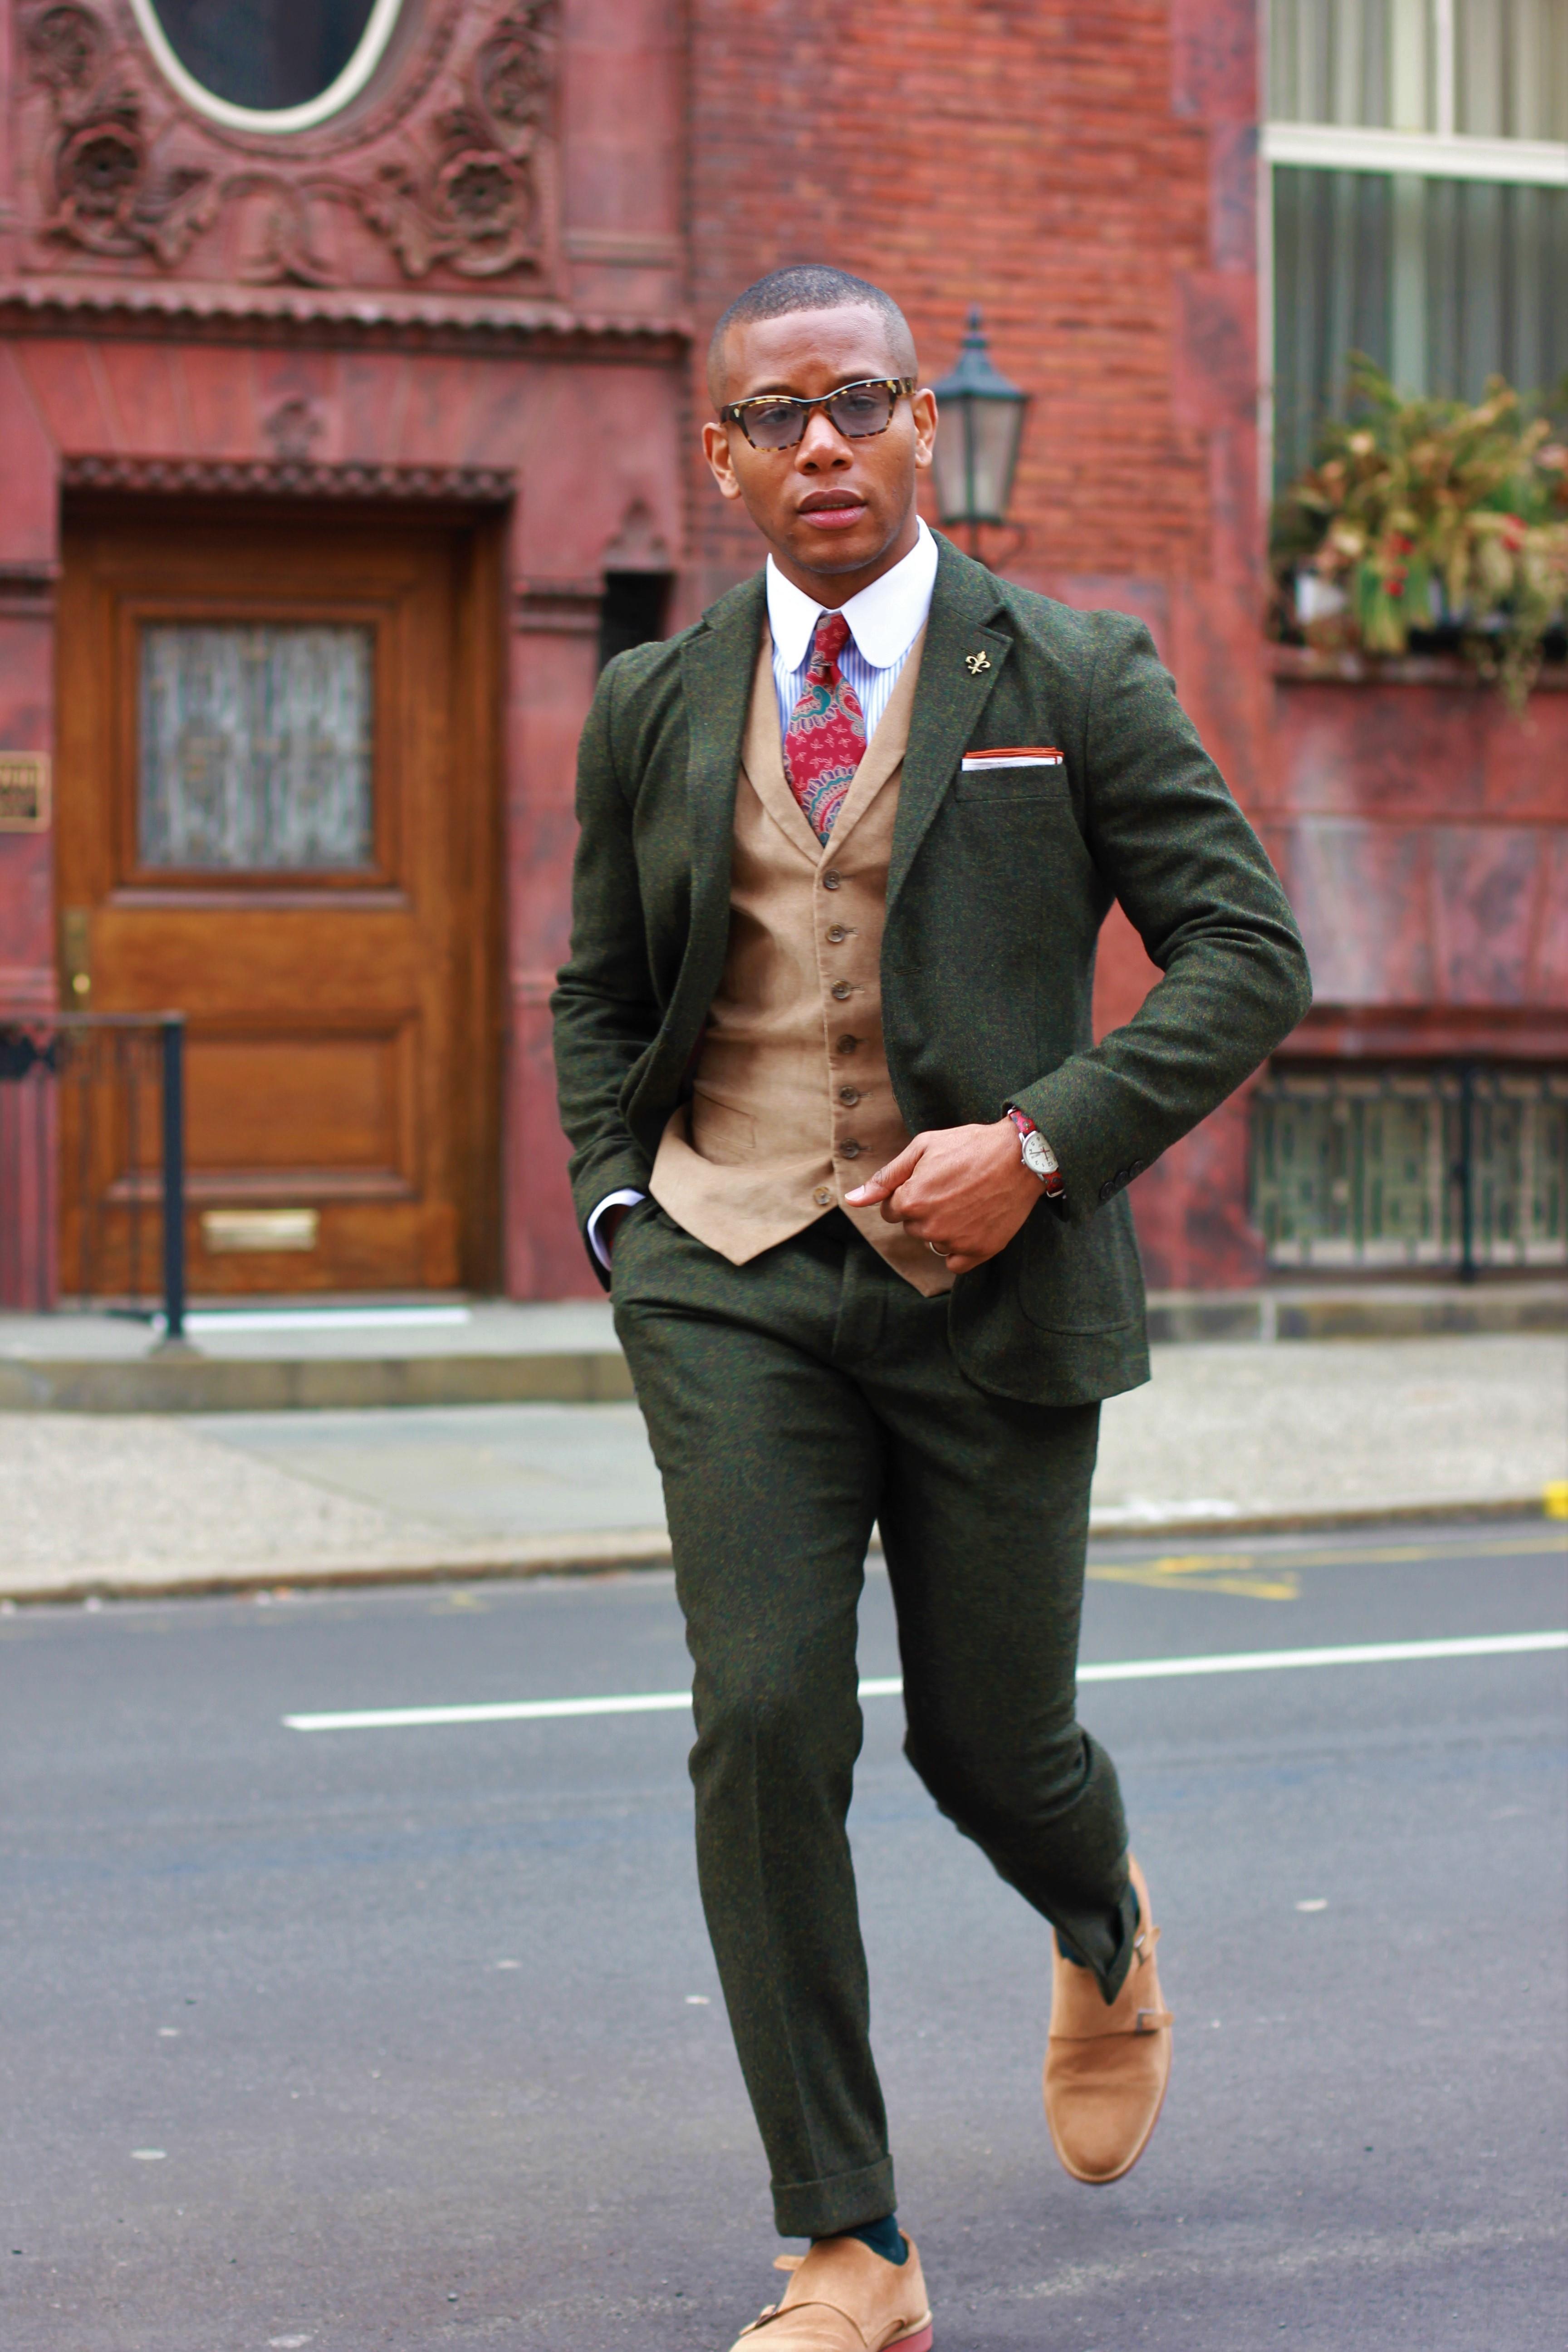 Sabir M. Peele of Men's Style Pro in Frank & Oak Green Tweed Suit